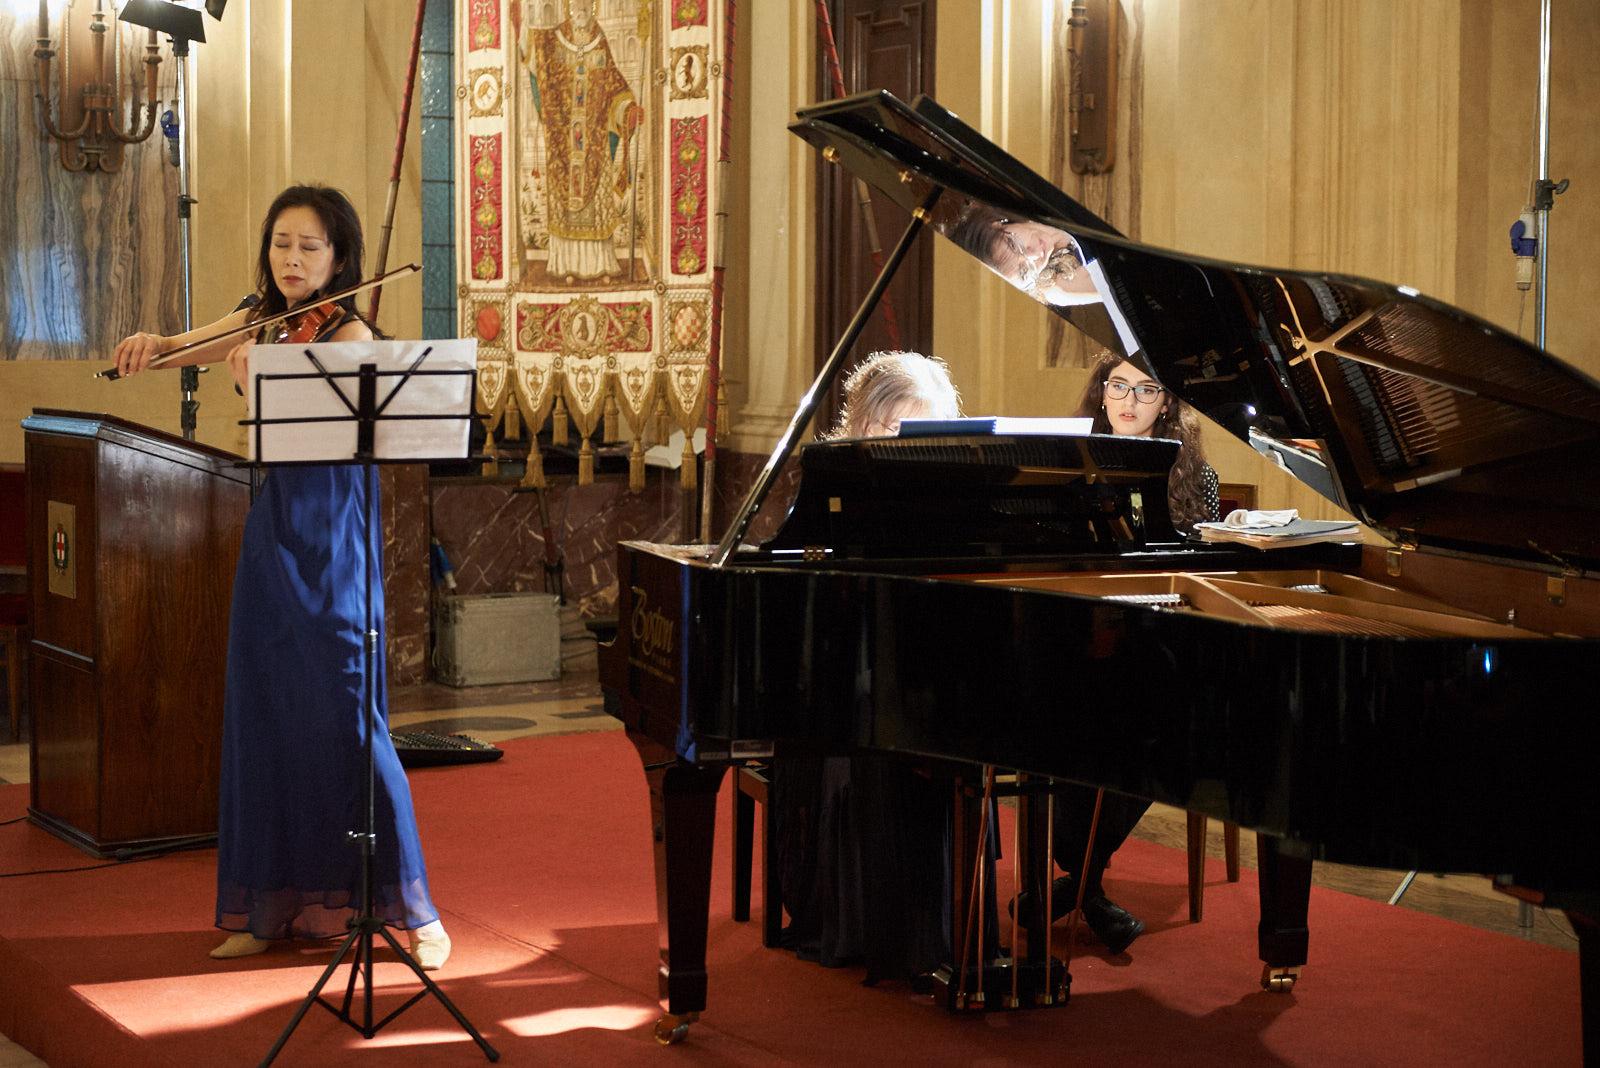 Nobuko Murakoshi with her violin. At the piano, Ani Martirosyan